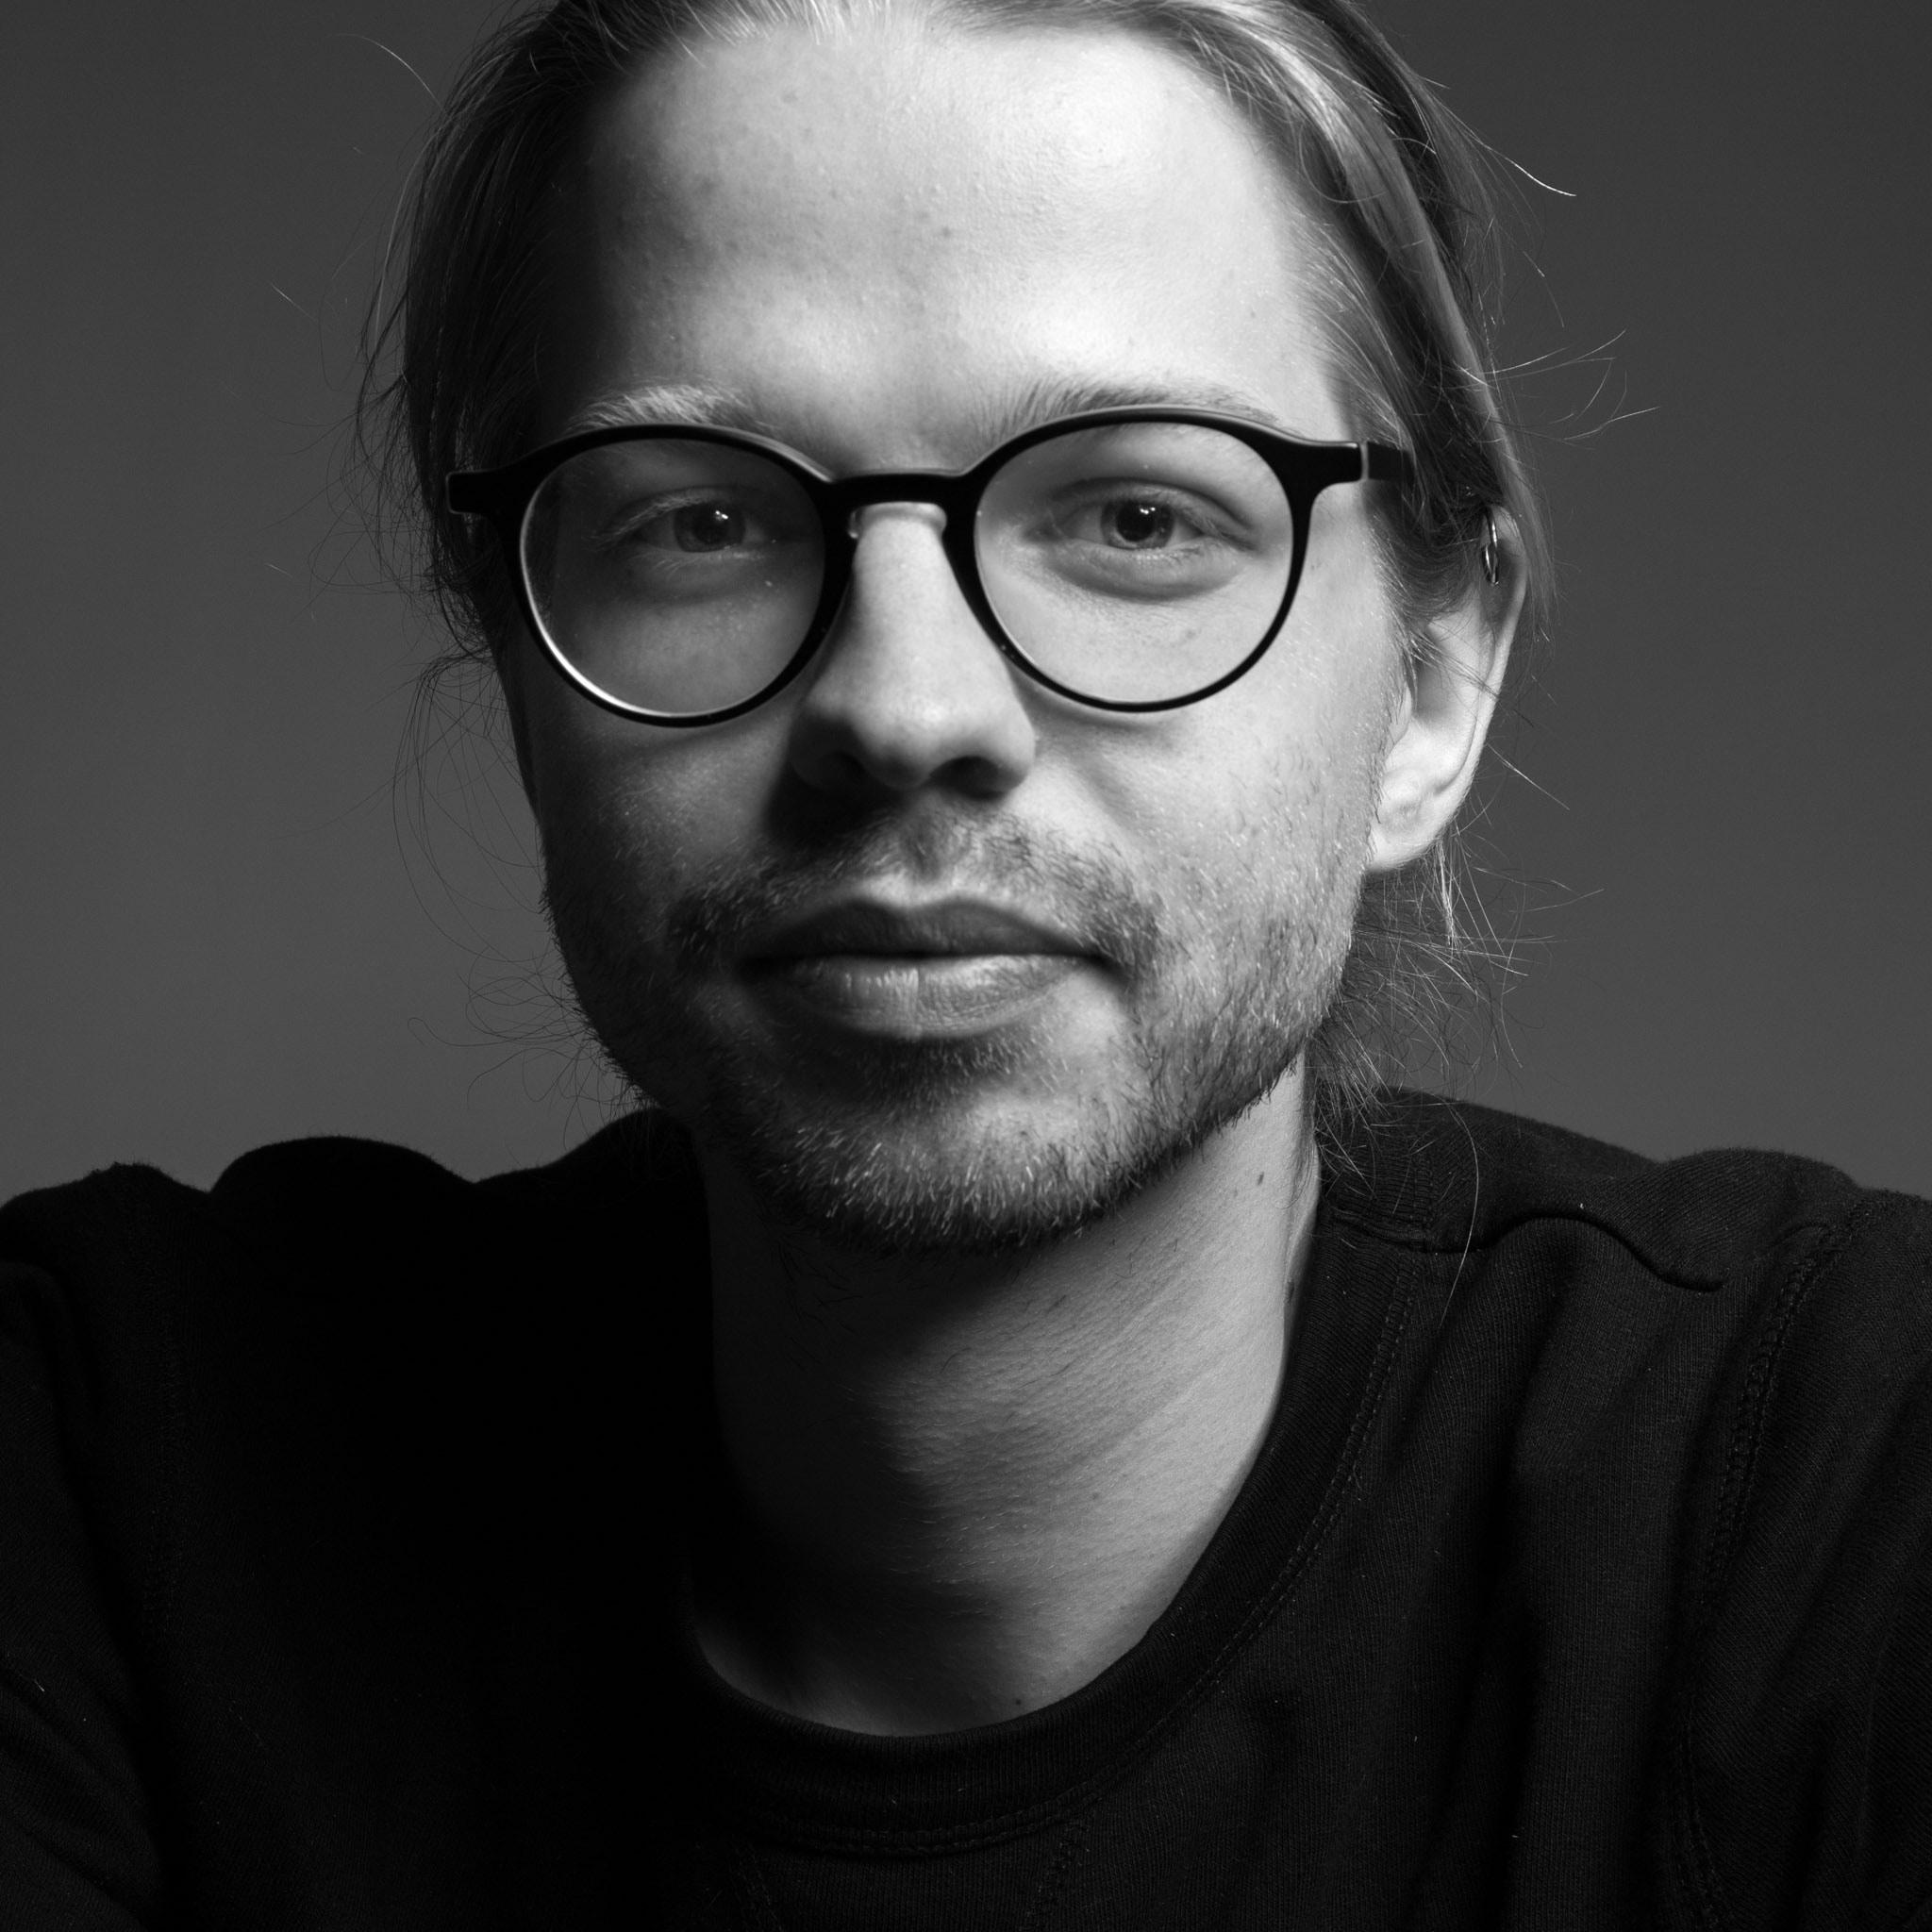 Go to Nicola Tröhler's profile